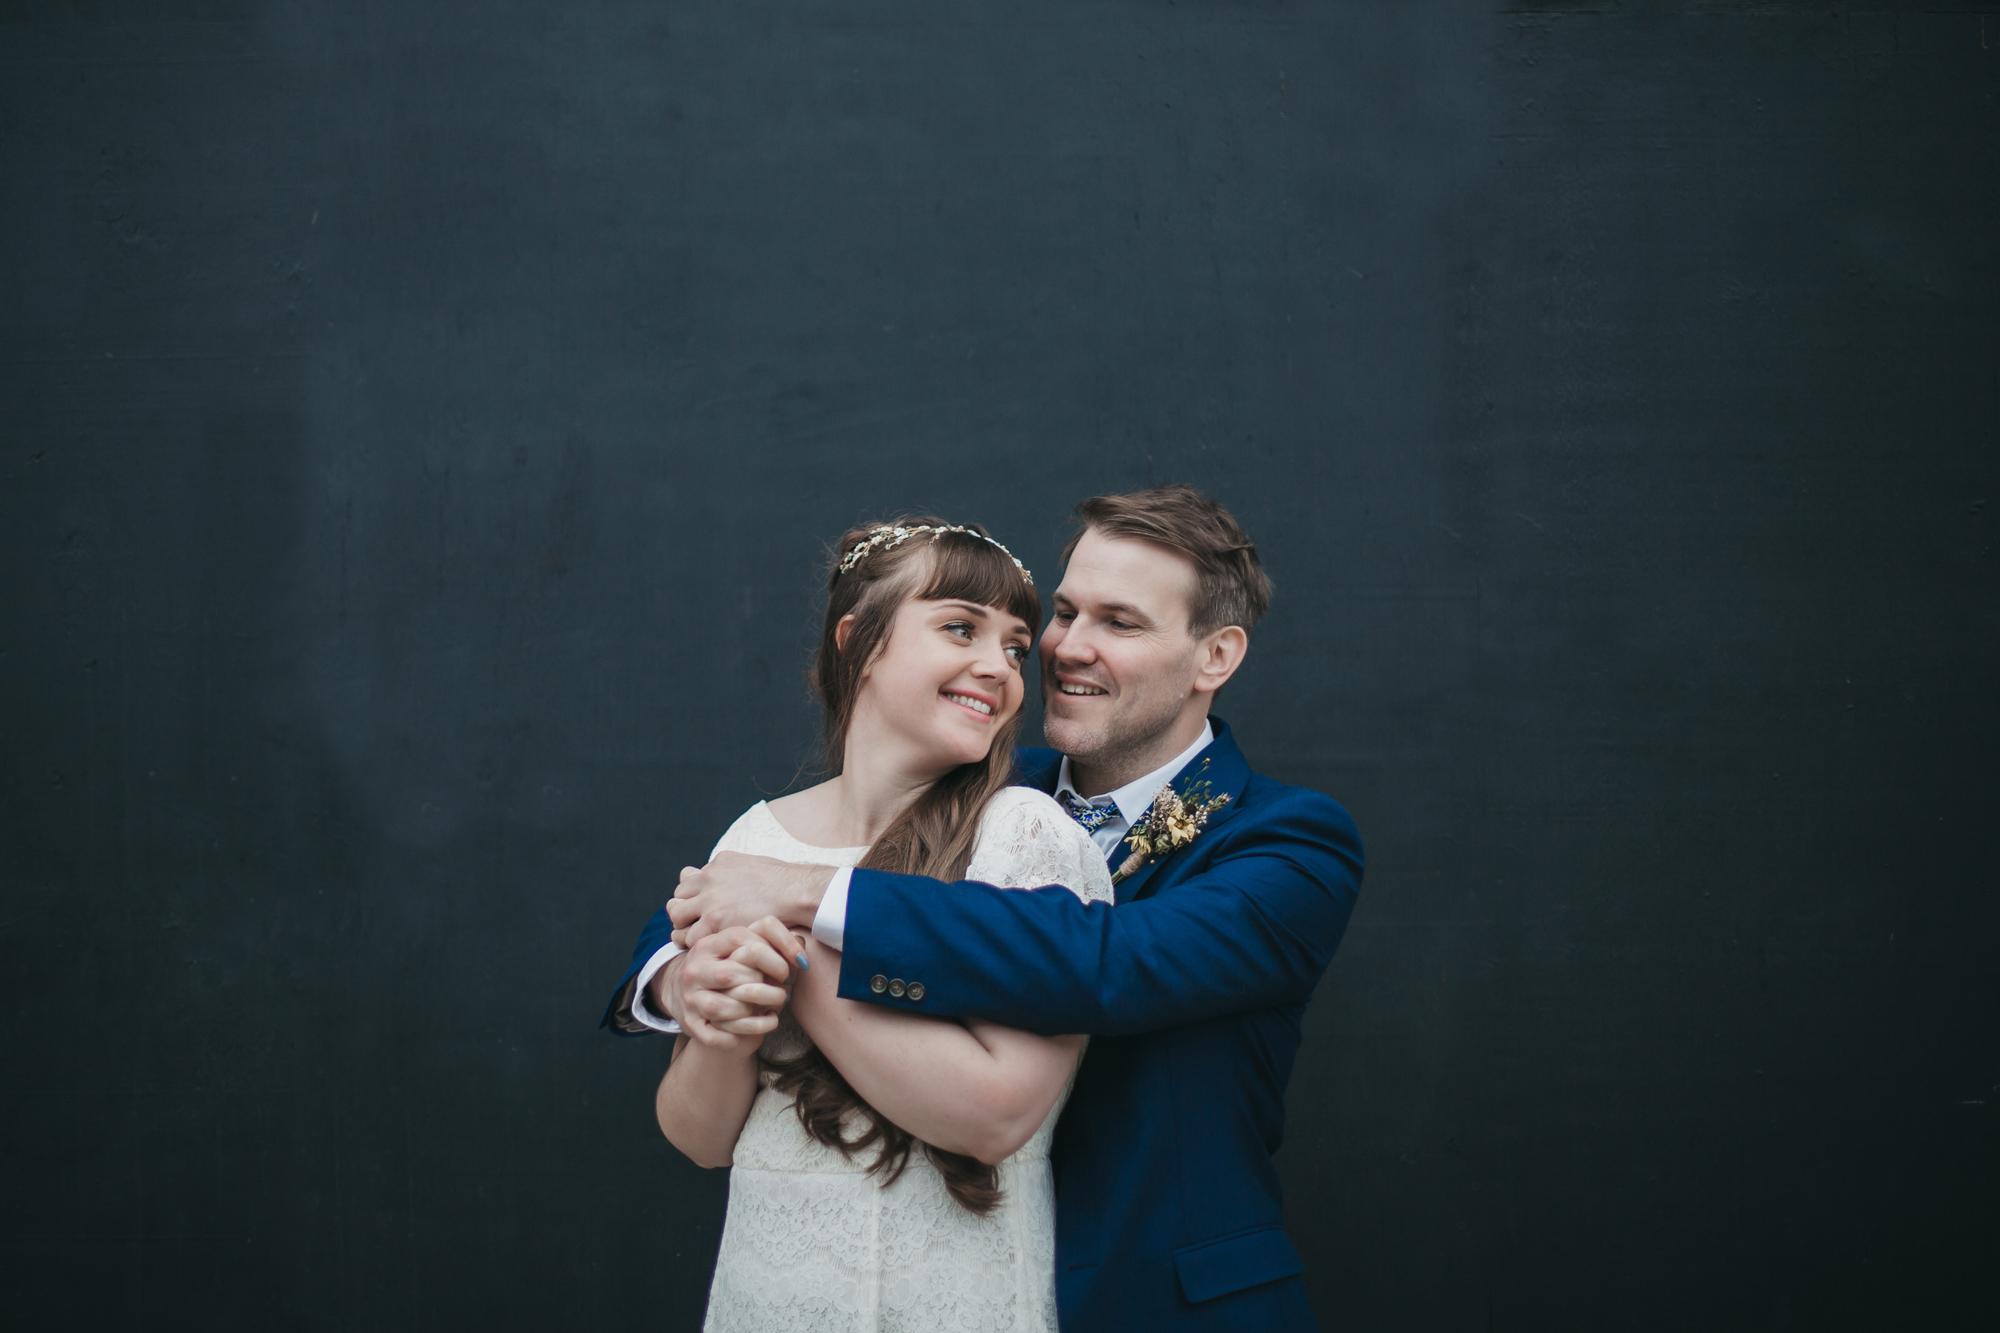 Kristy-Back-Garden-Outdoor-Wedding-Sheffield-Industrial-Warehouse-Wedding-Bohemian-Kate-Beaumont-Dahlia-Dress-42.jpg